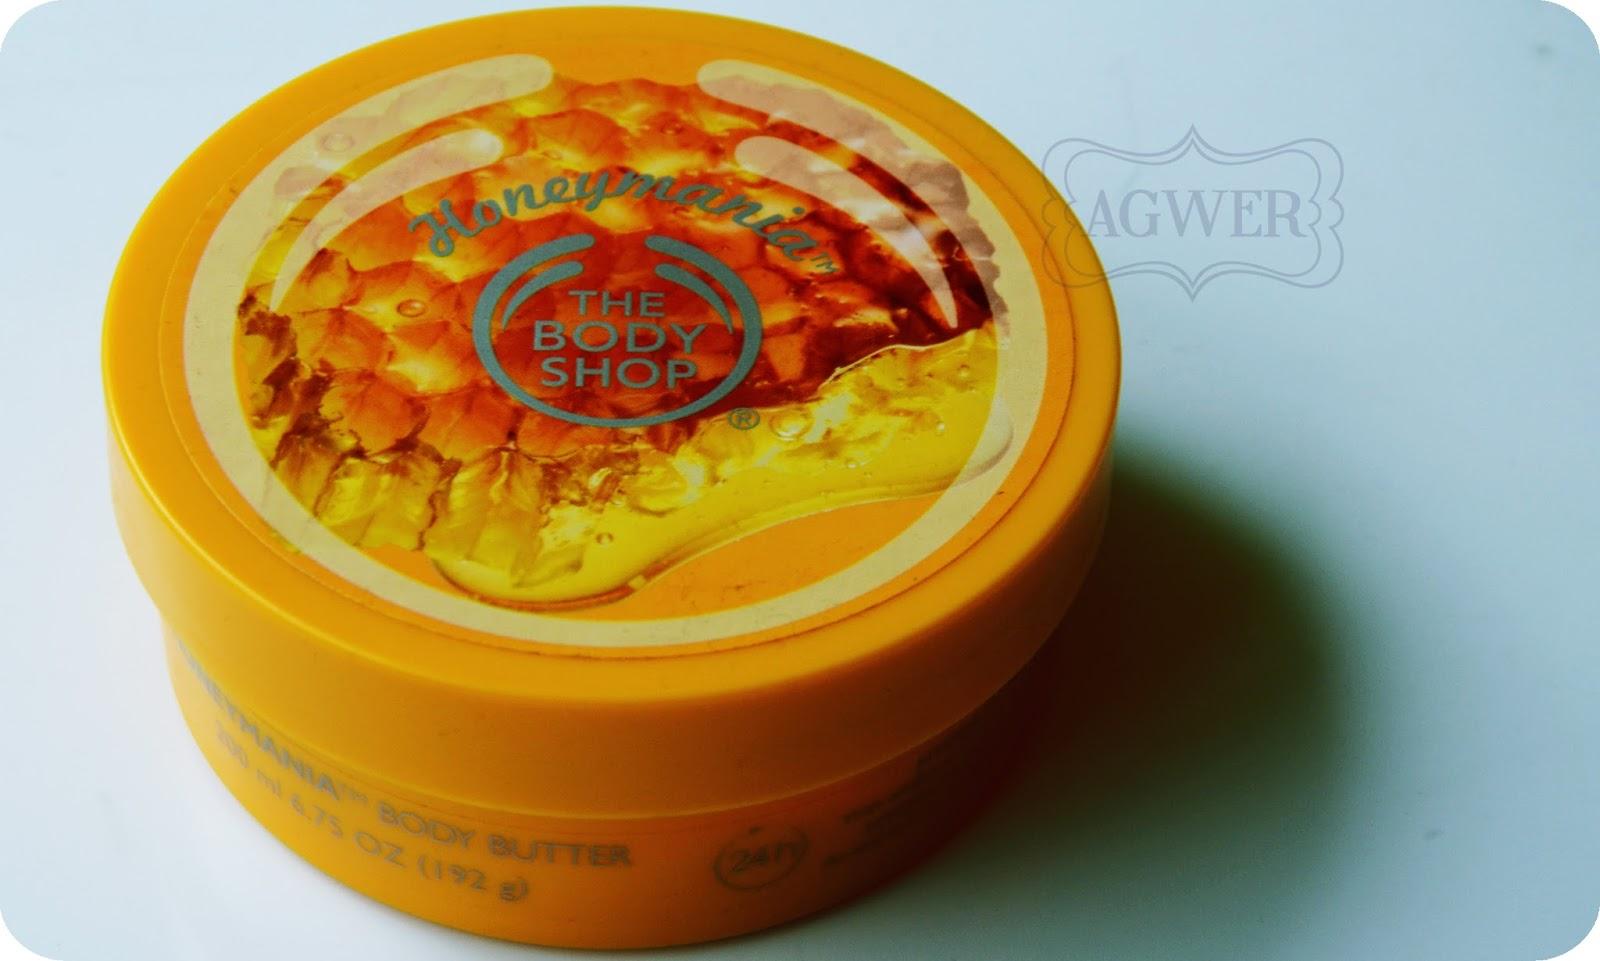 Honeymania The Body Shop